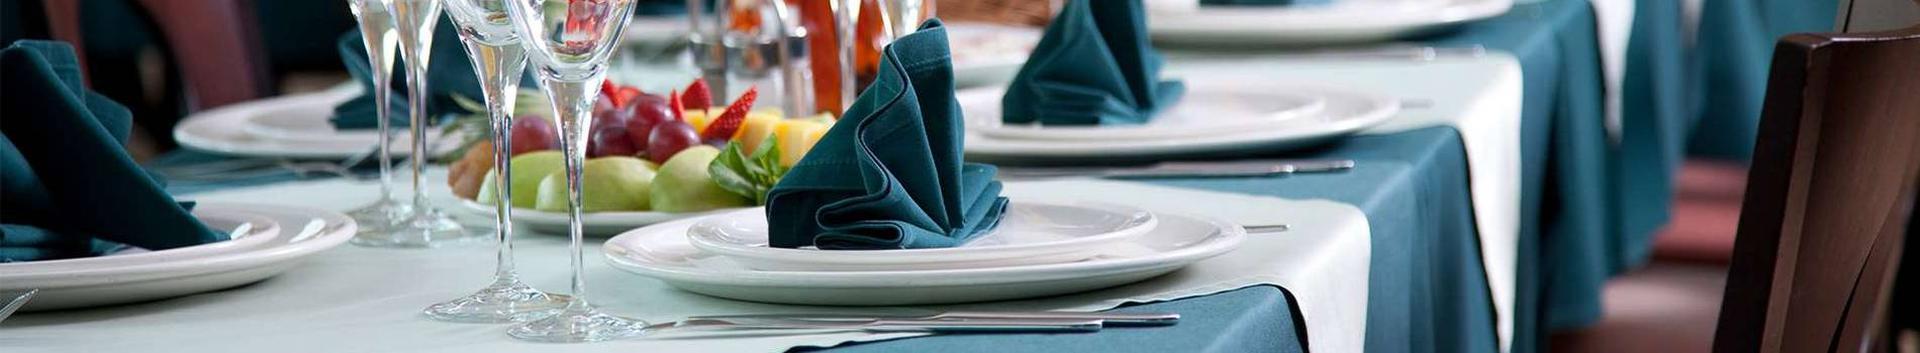 56101_toitlustus-restoran-jm-_92612869_xl.jpg